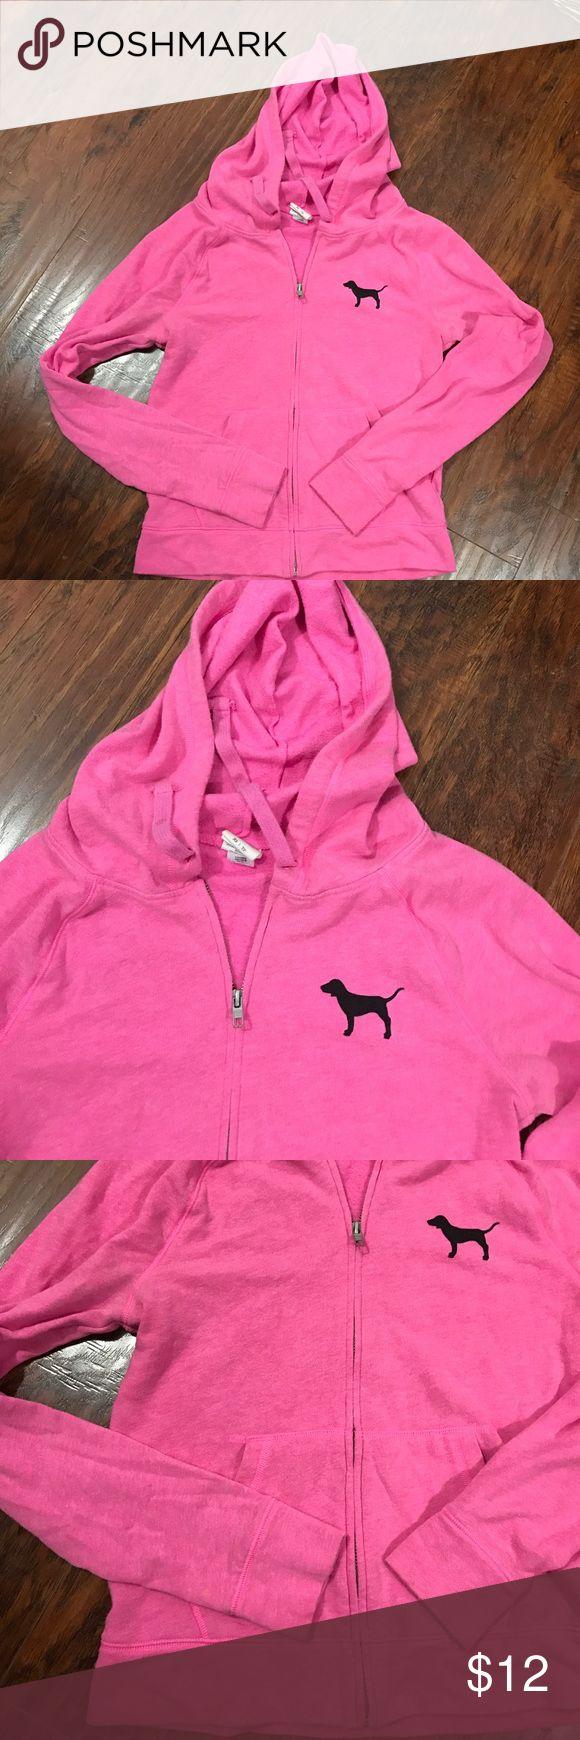 XS Pink zip up Hoodie Pink hoodie by Pink Victoria's Secret zip up with hood. 60% cotton, 40% polyester PINK Victoria's Secret Tops Sweatshirts & Hoodies